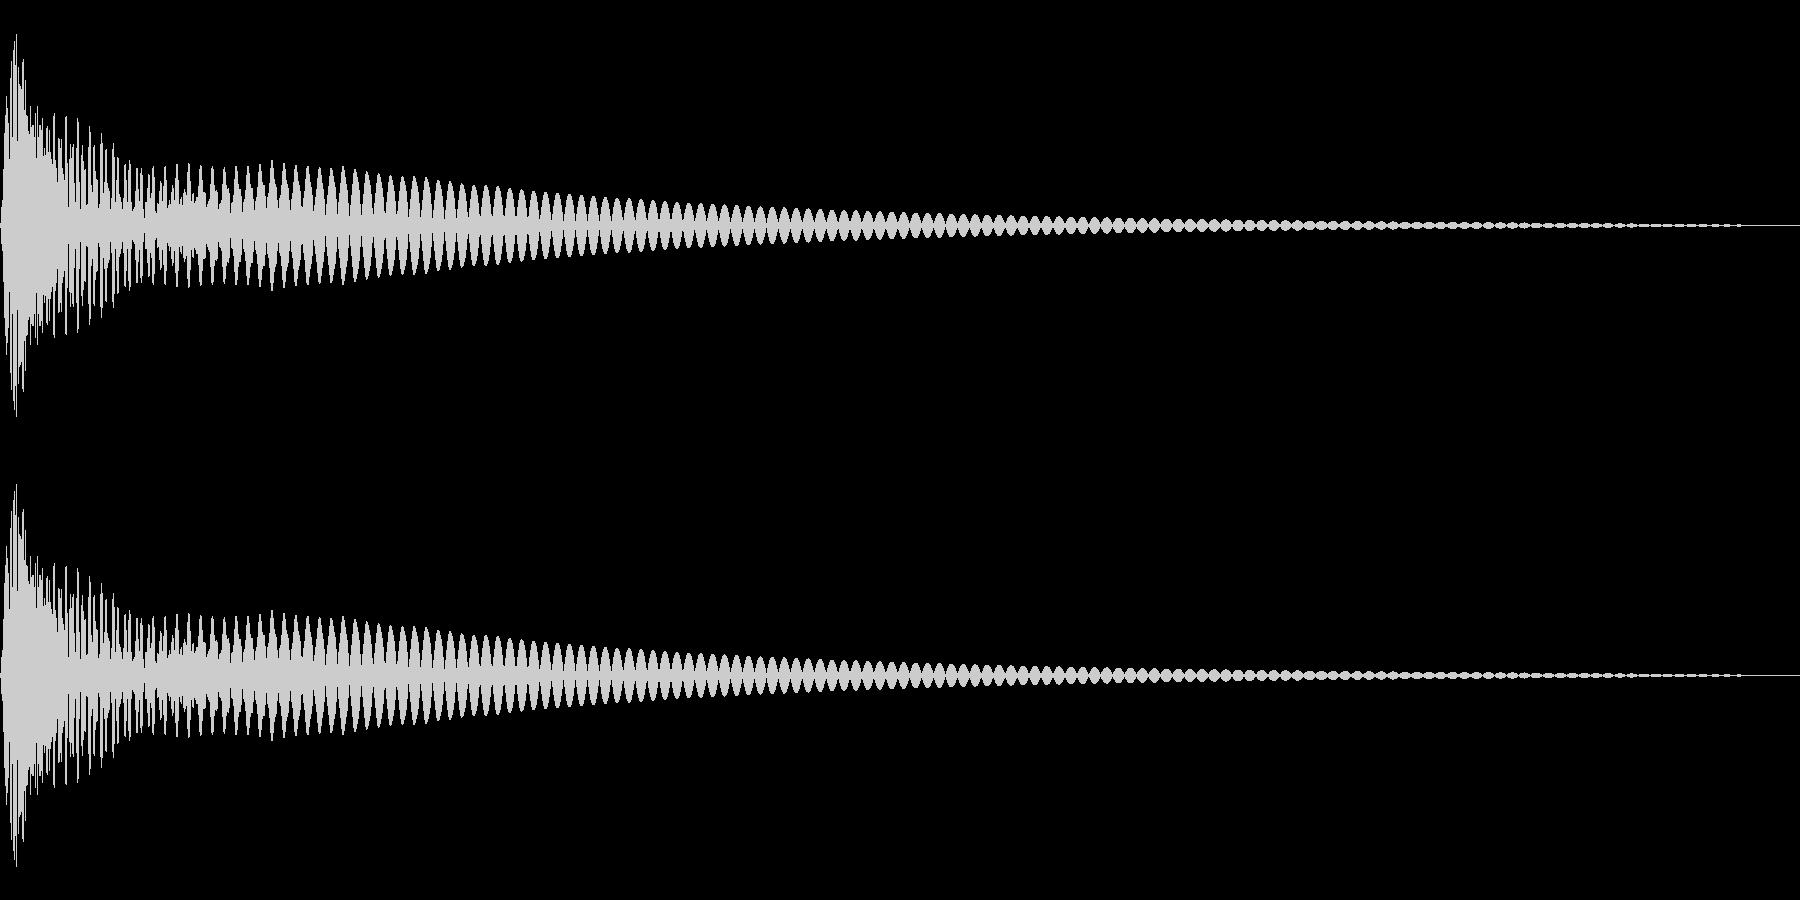 DTM Tom 33 オリジナル音源の未再生の波形